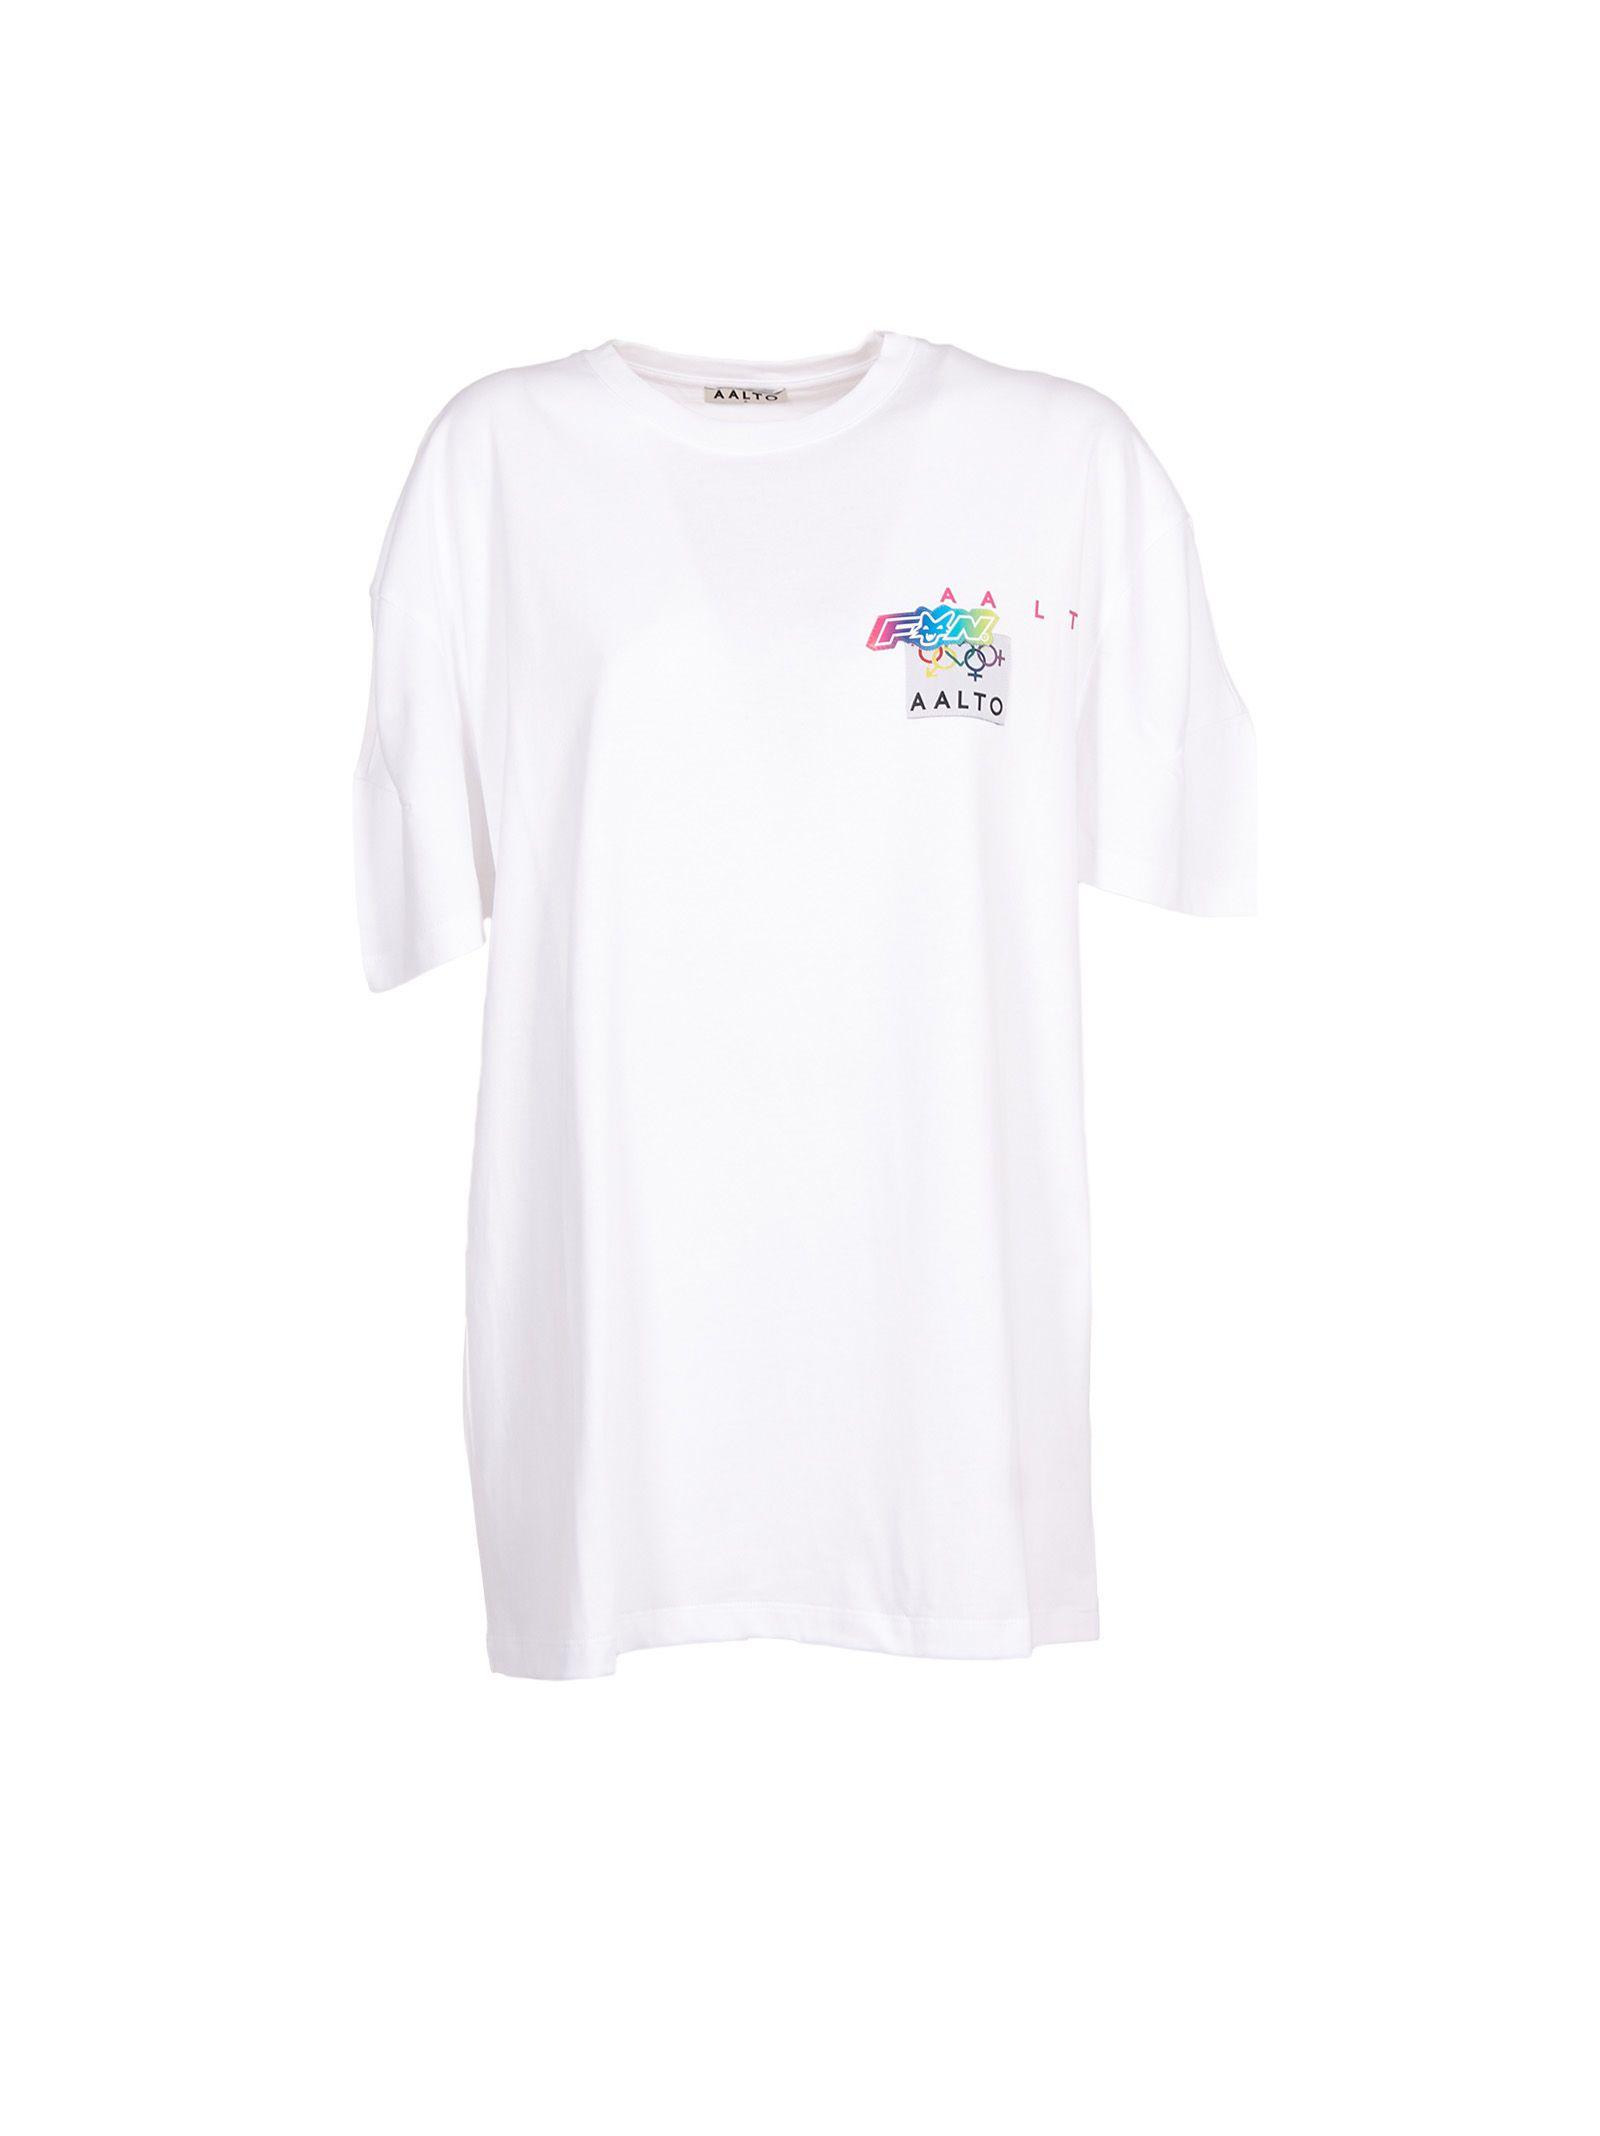 aalto female aalto logo print tshirt